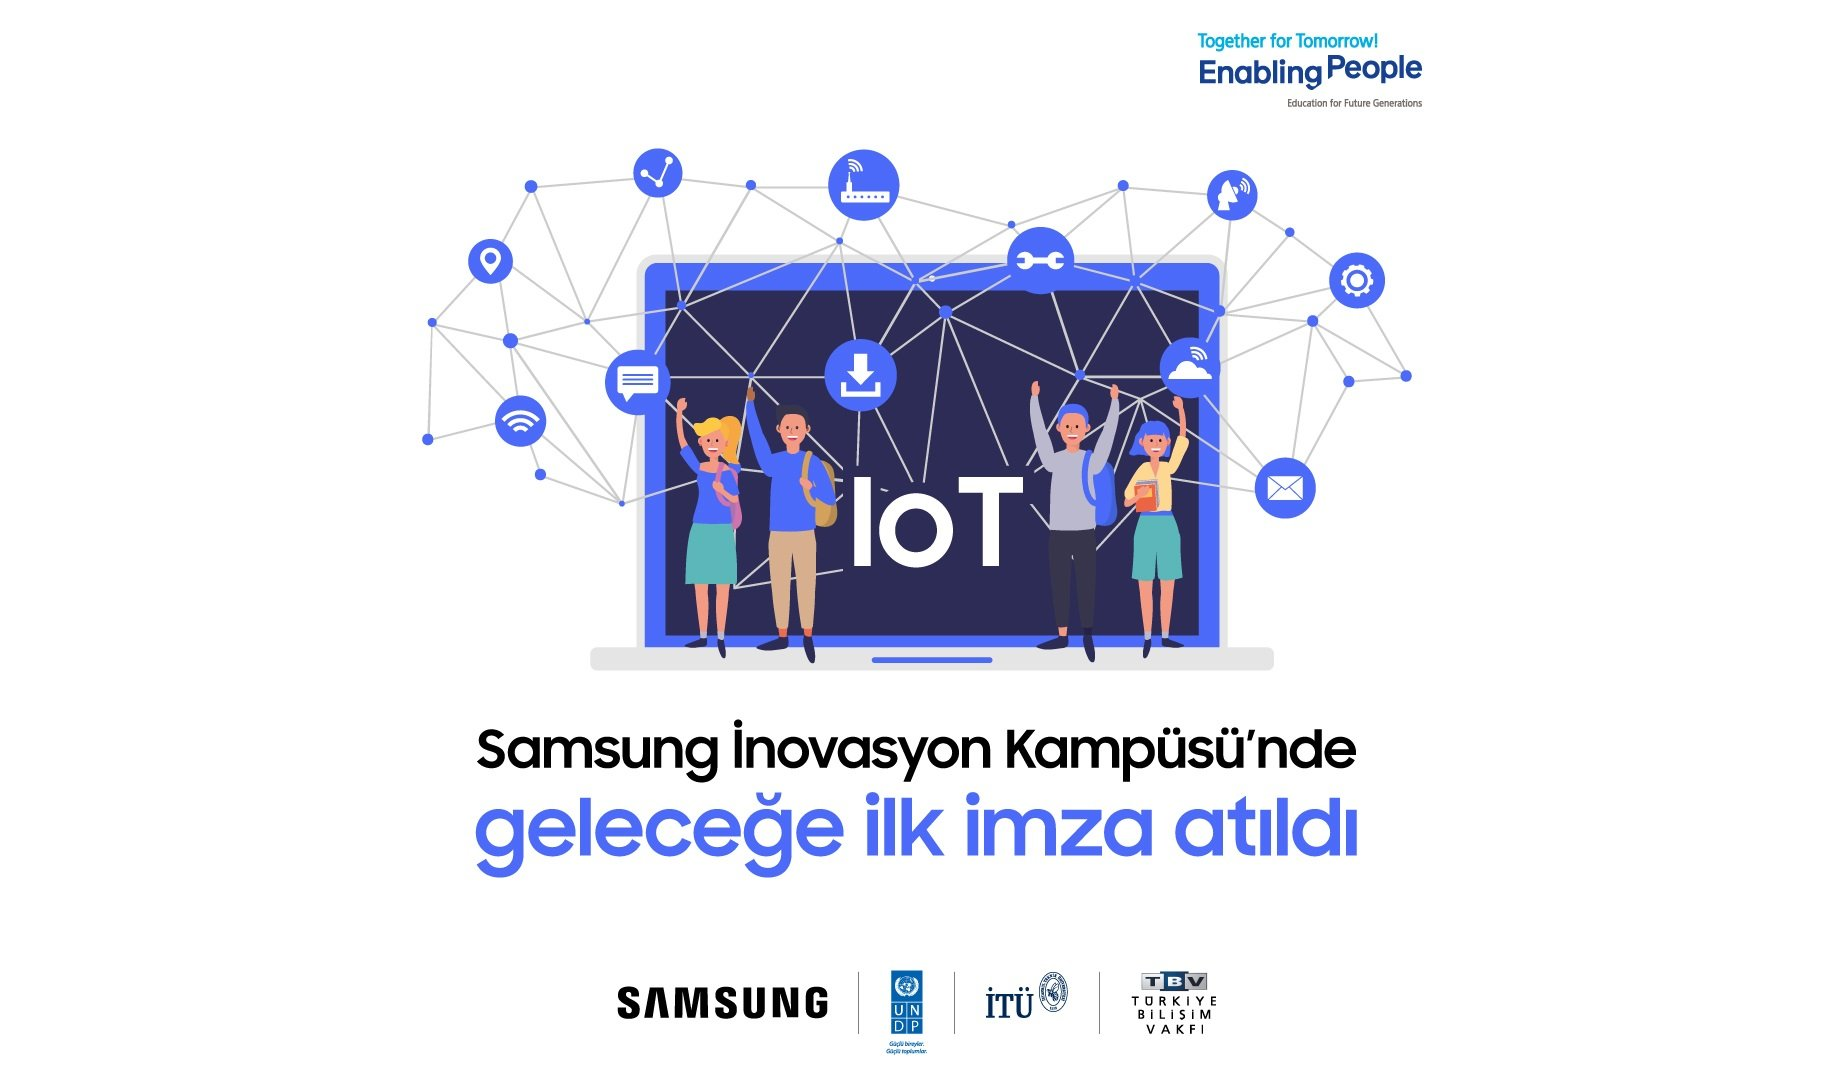 Samsung İnovasyon Kampüsü